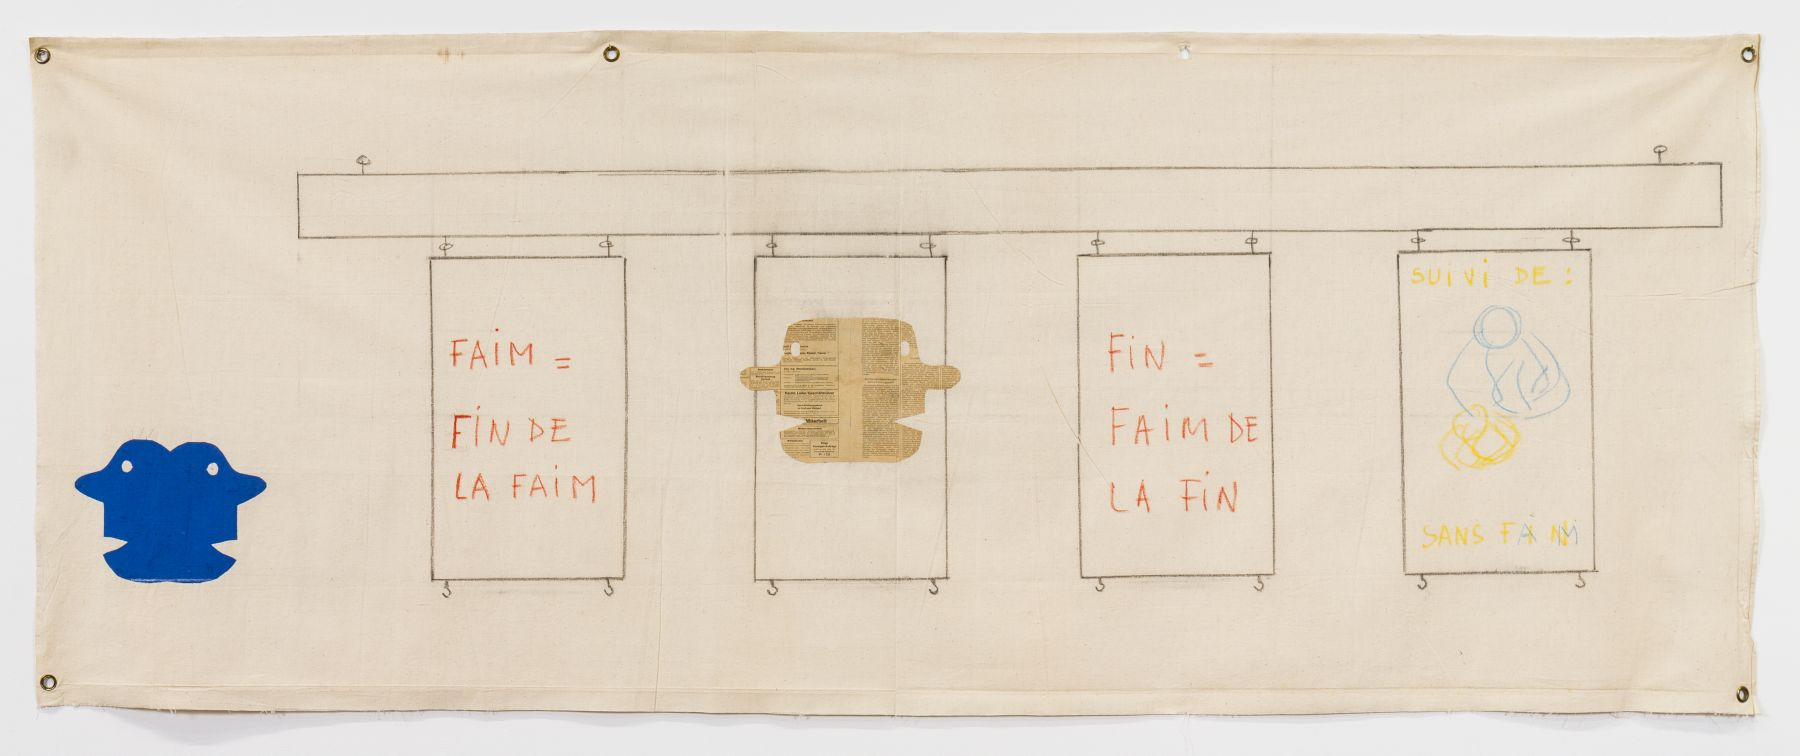 Faim = Fin de la faim [Hunger = End of Hunger], 1962/1975/1978